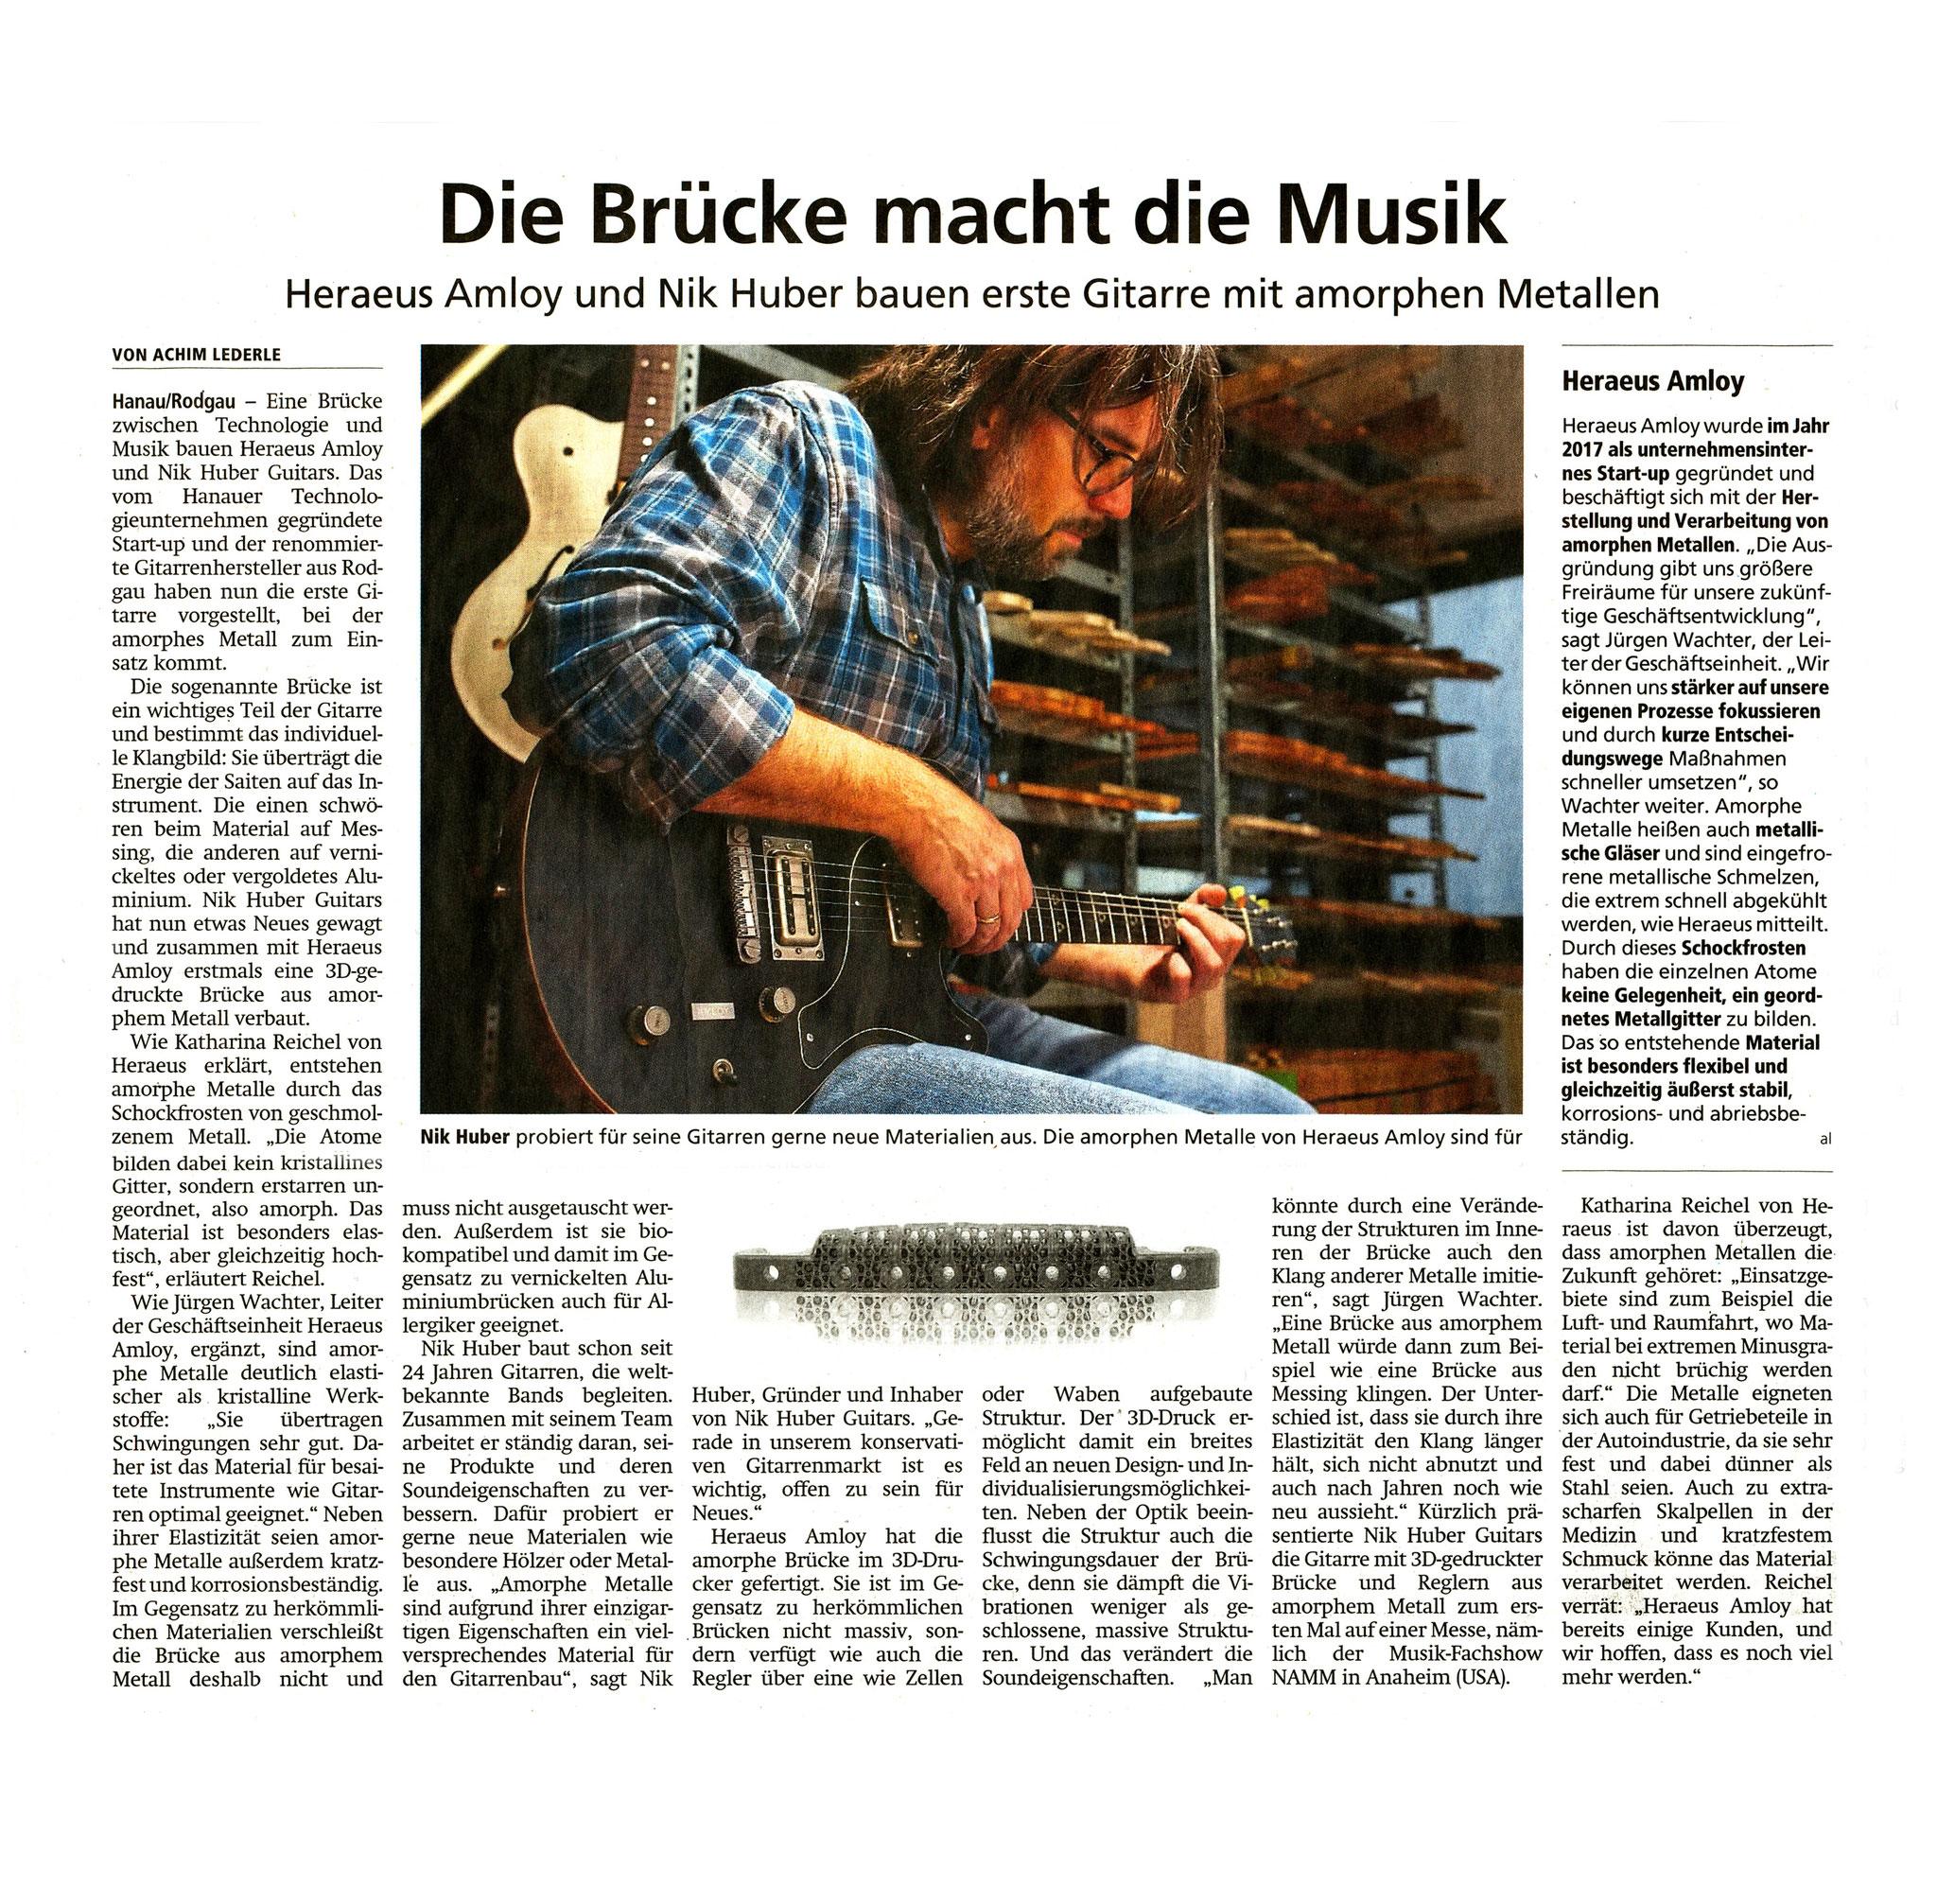 Offenbach Post, 20. Januar 2020